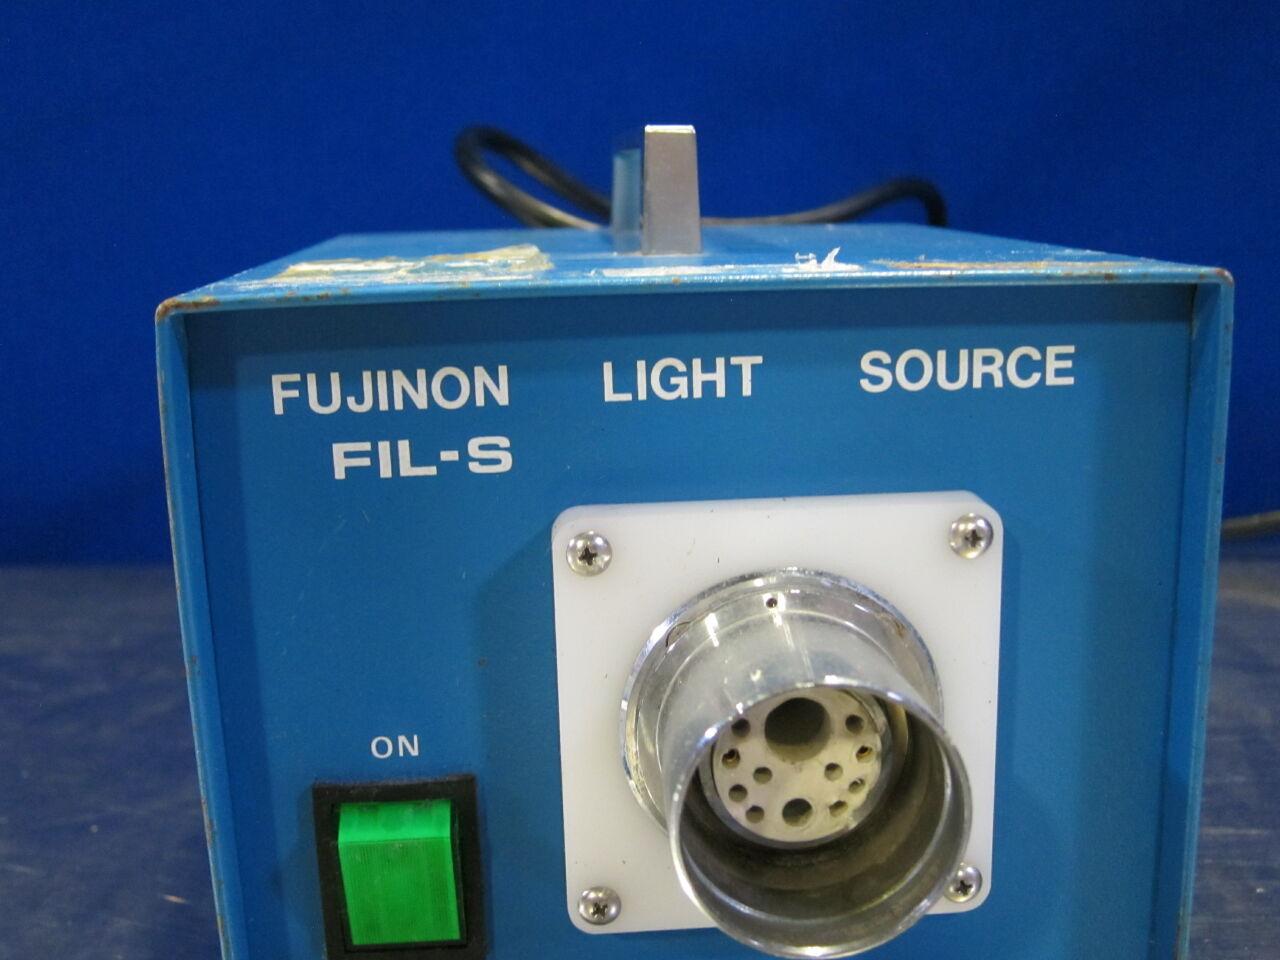 FUJI PHOTO OPTICAL FIL-S Light Source